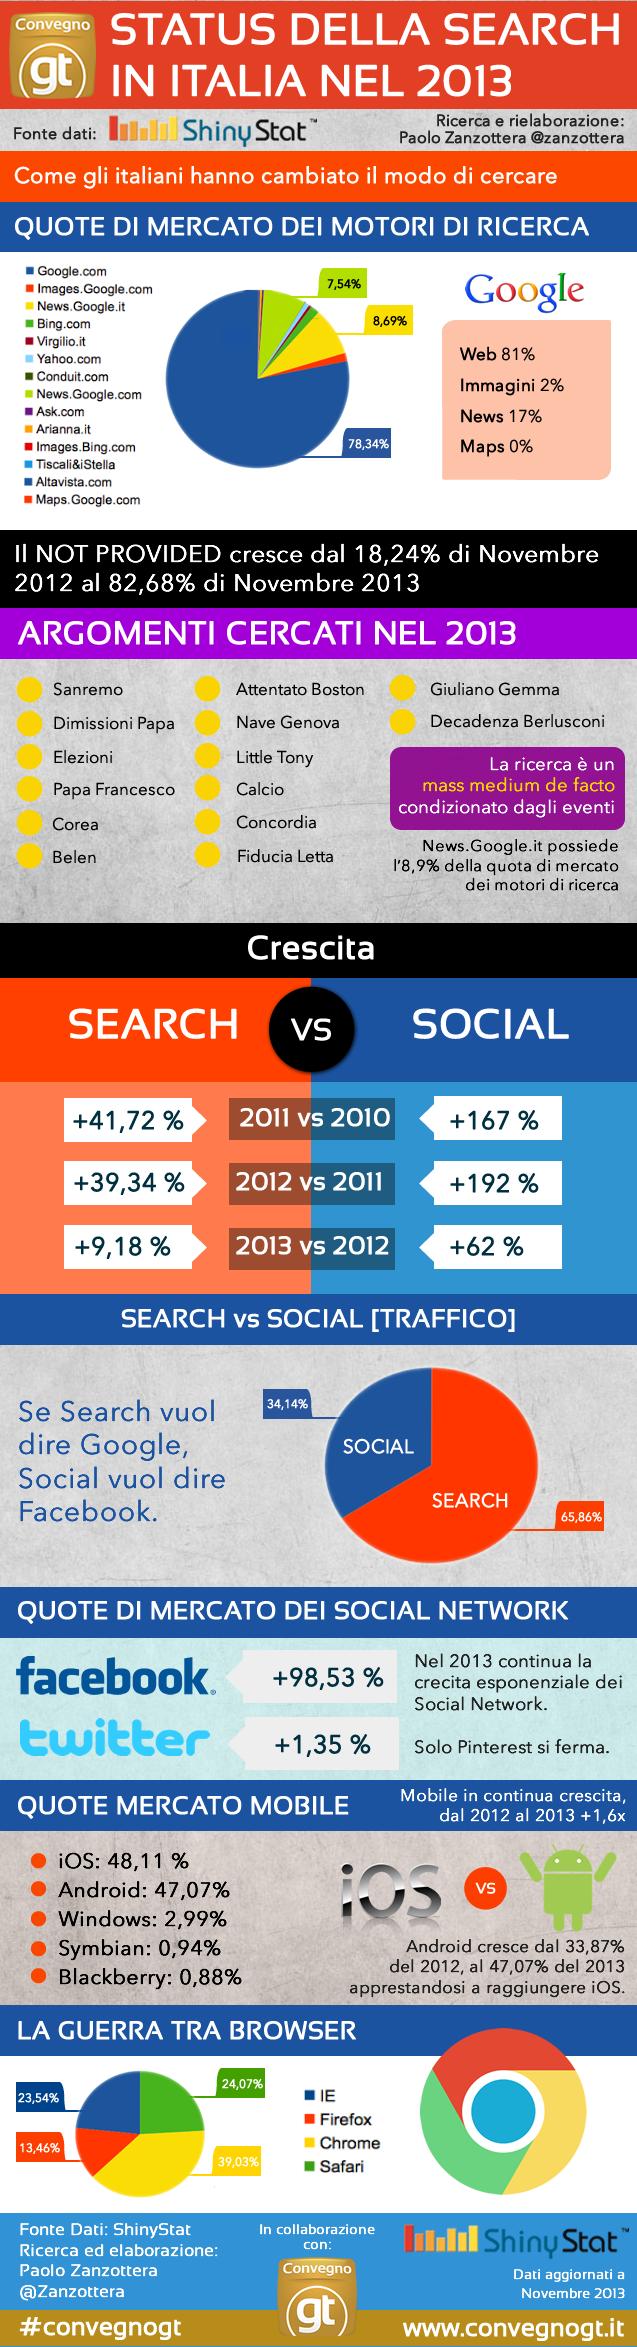 infografica-convegno-MODultima-FLAT